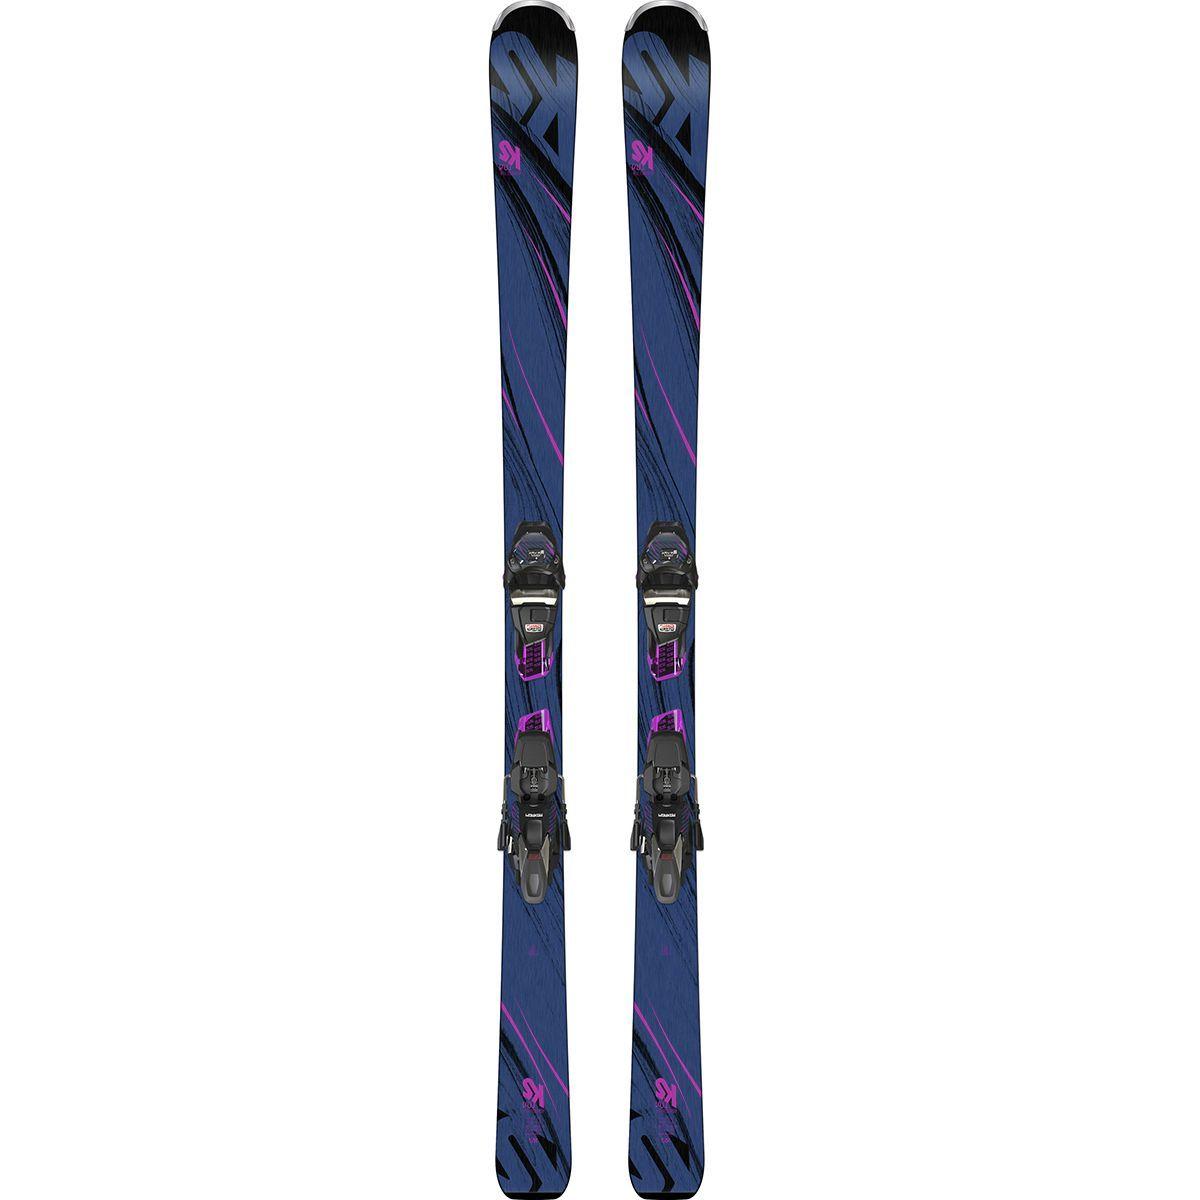 K2 Endless Luv Ski with Binding - Women's